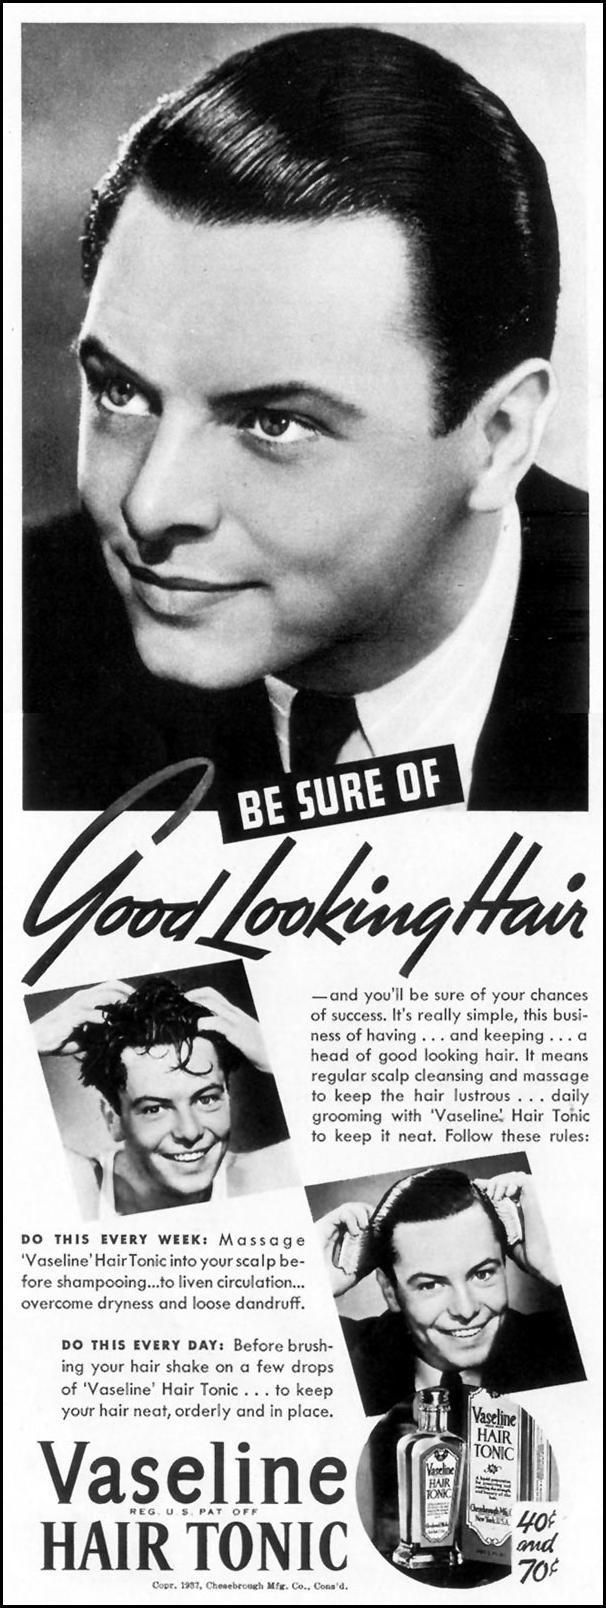 VASELINE HAIR TONIC LIFE 10/04/1937 p. 72